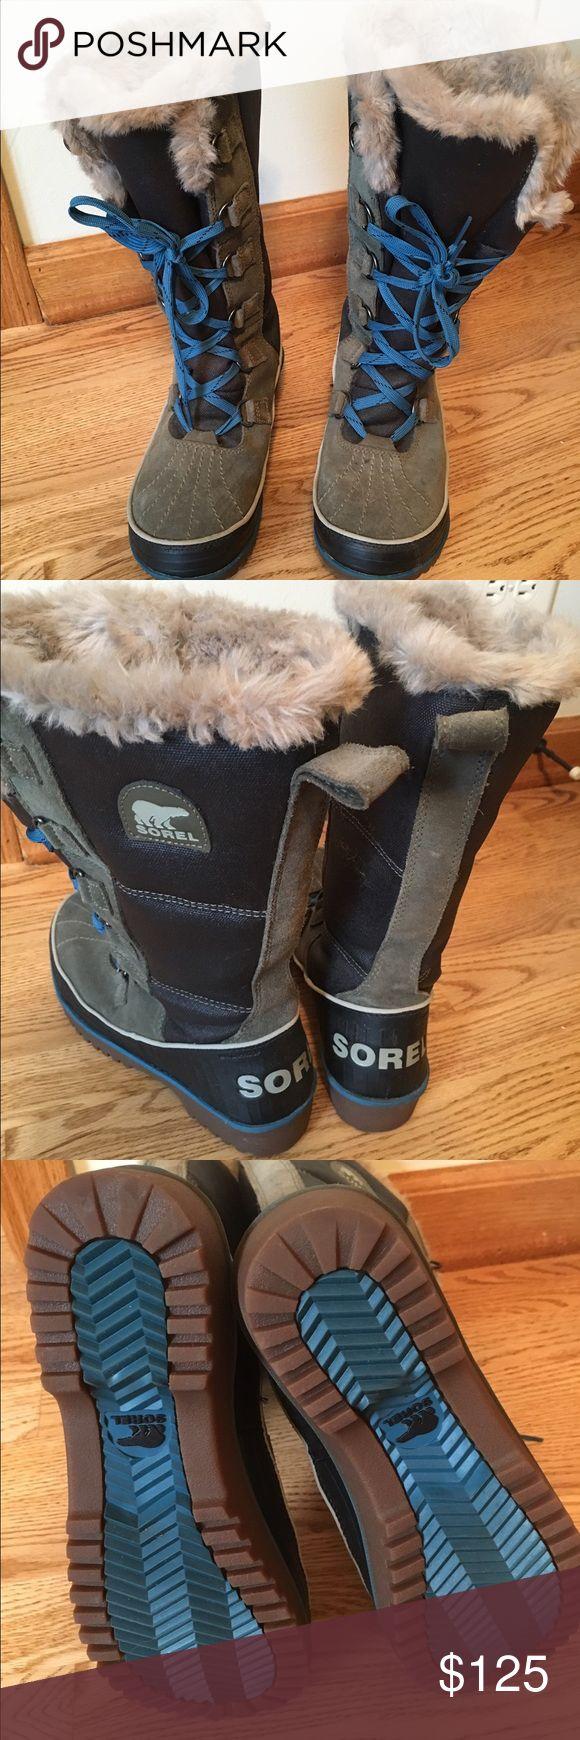 Sorel Joan of Arc Boots size 7 Women's Sorel Joan of Arc Boot size 7. Like new, only worn twice. True to size! Sorel Shoes Winter & Rain Boots